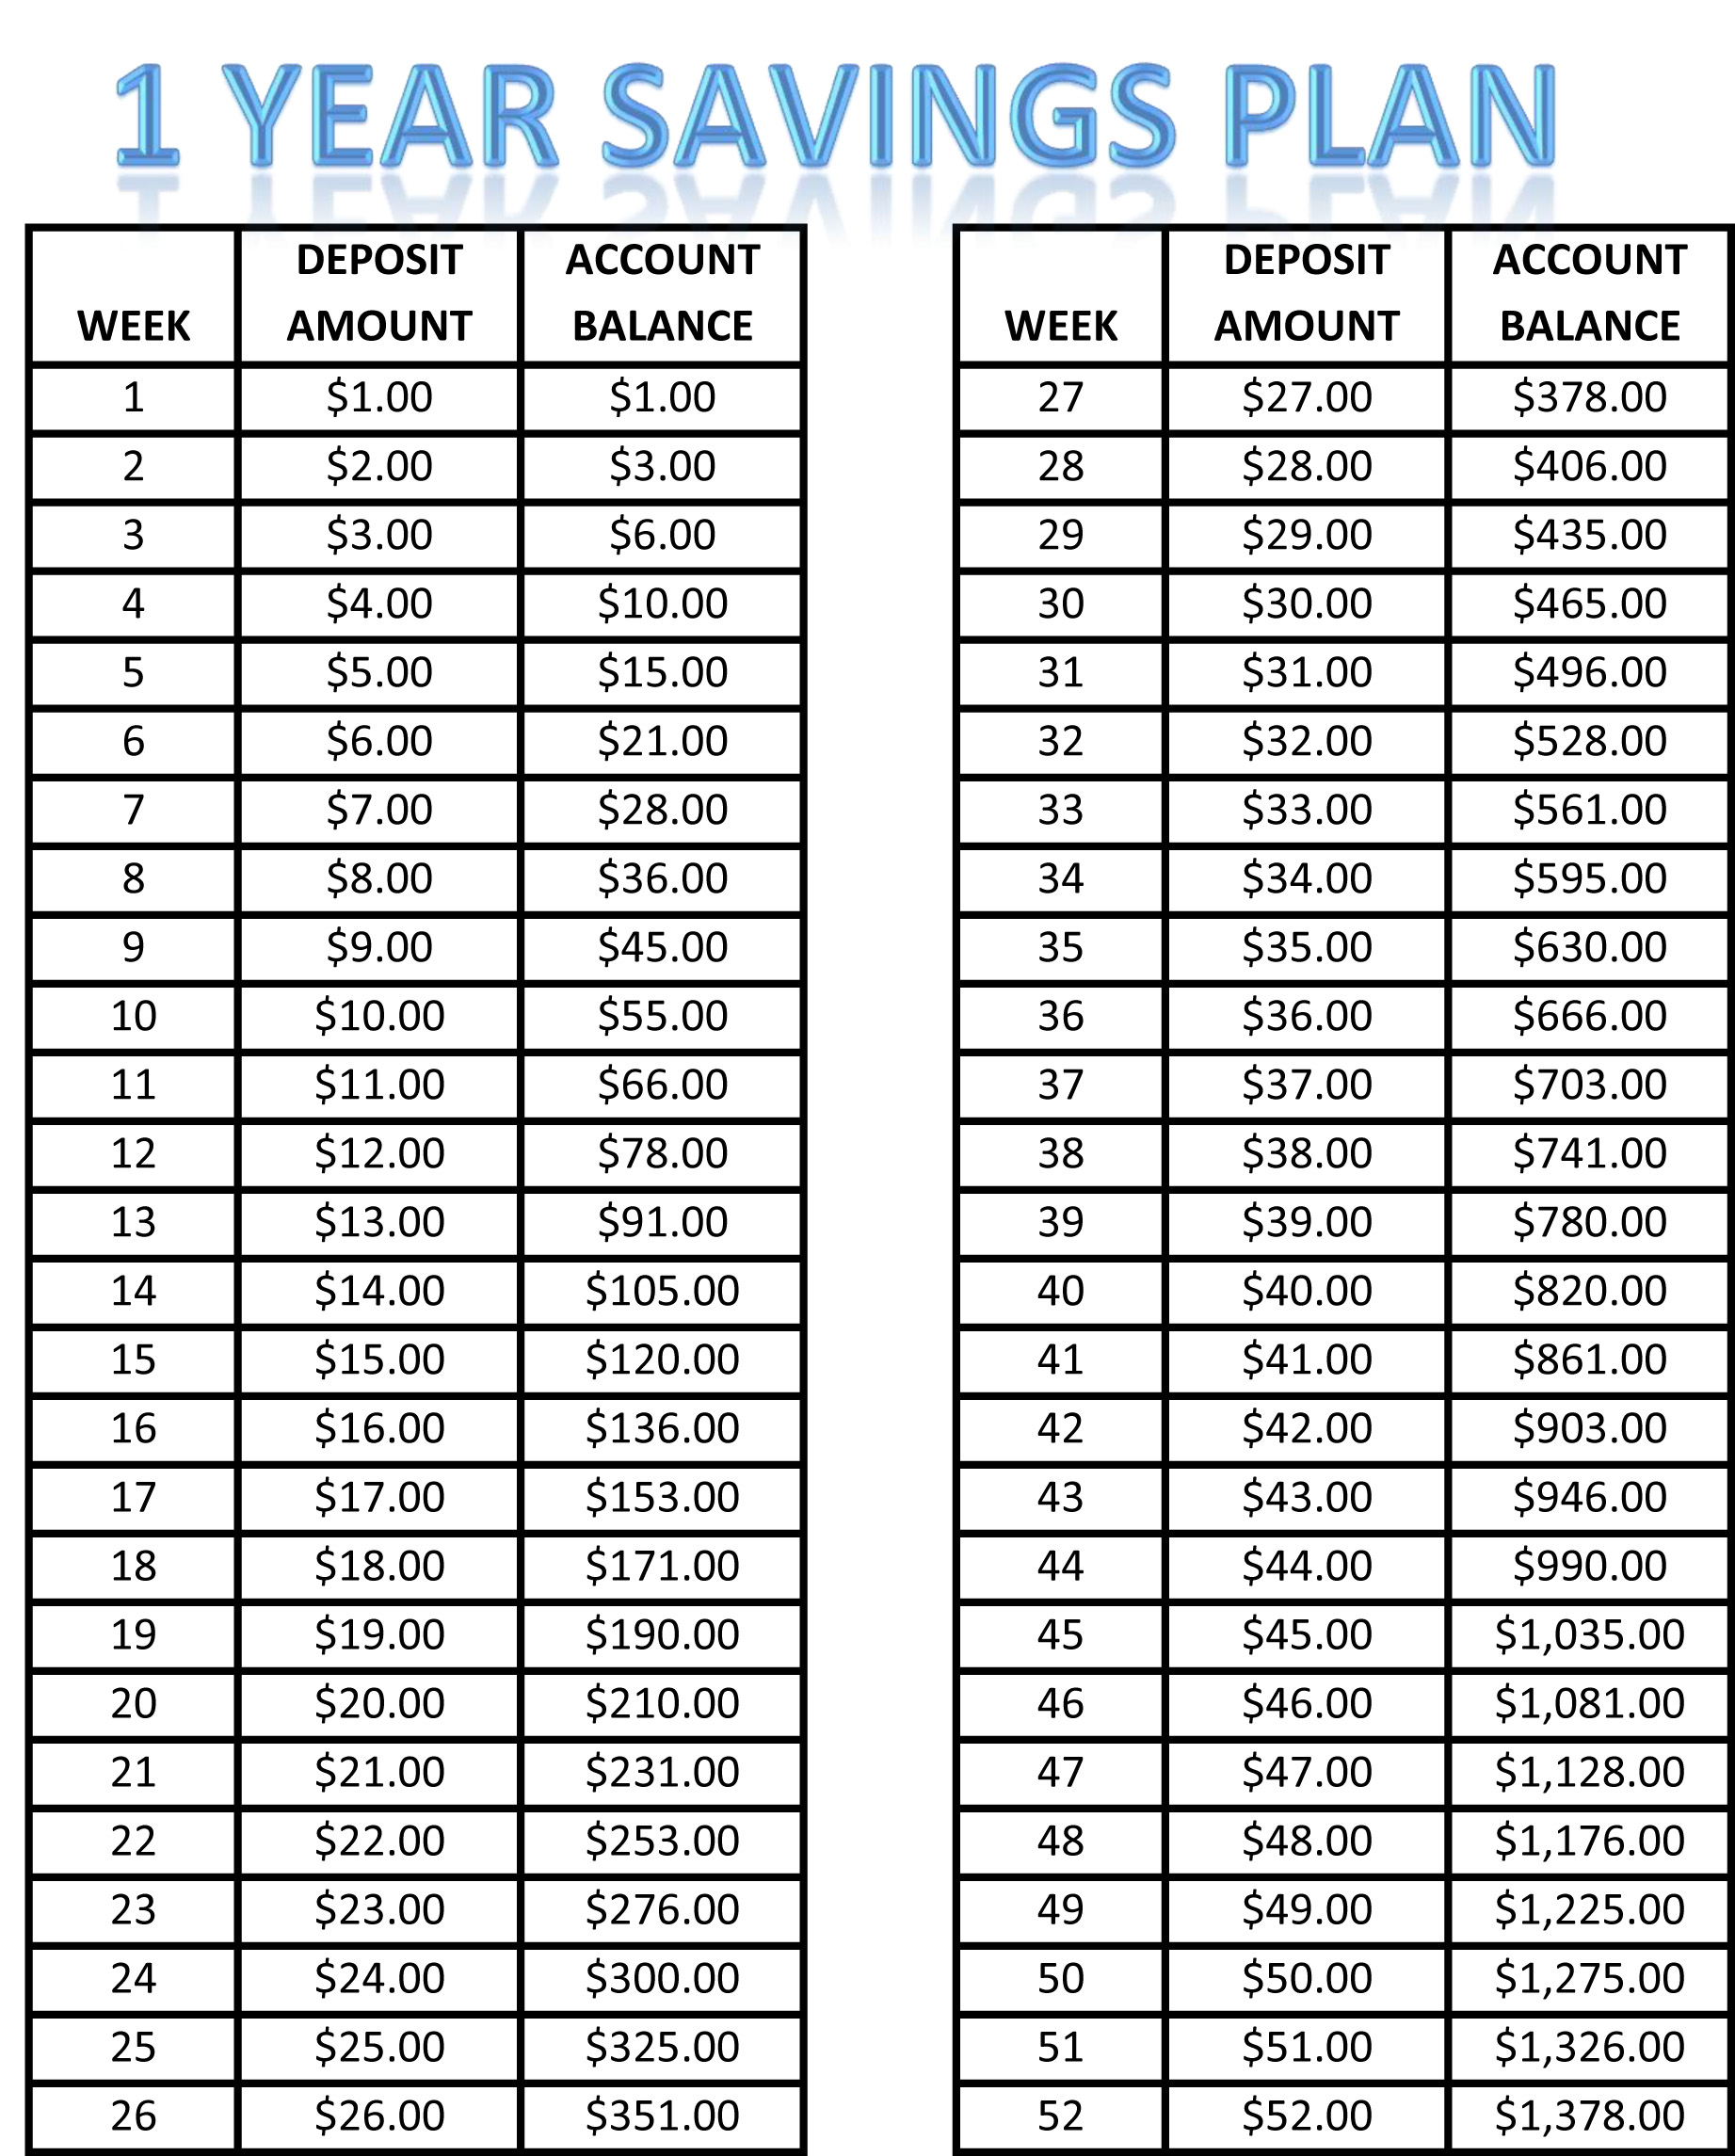 1 Yr Savings Plan Kbenservices